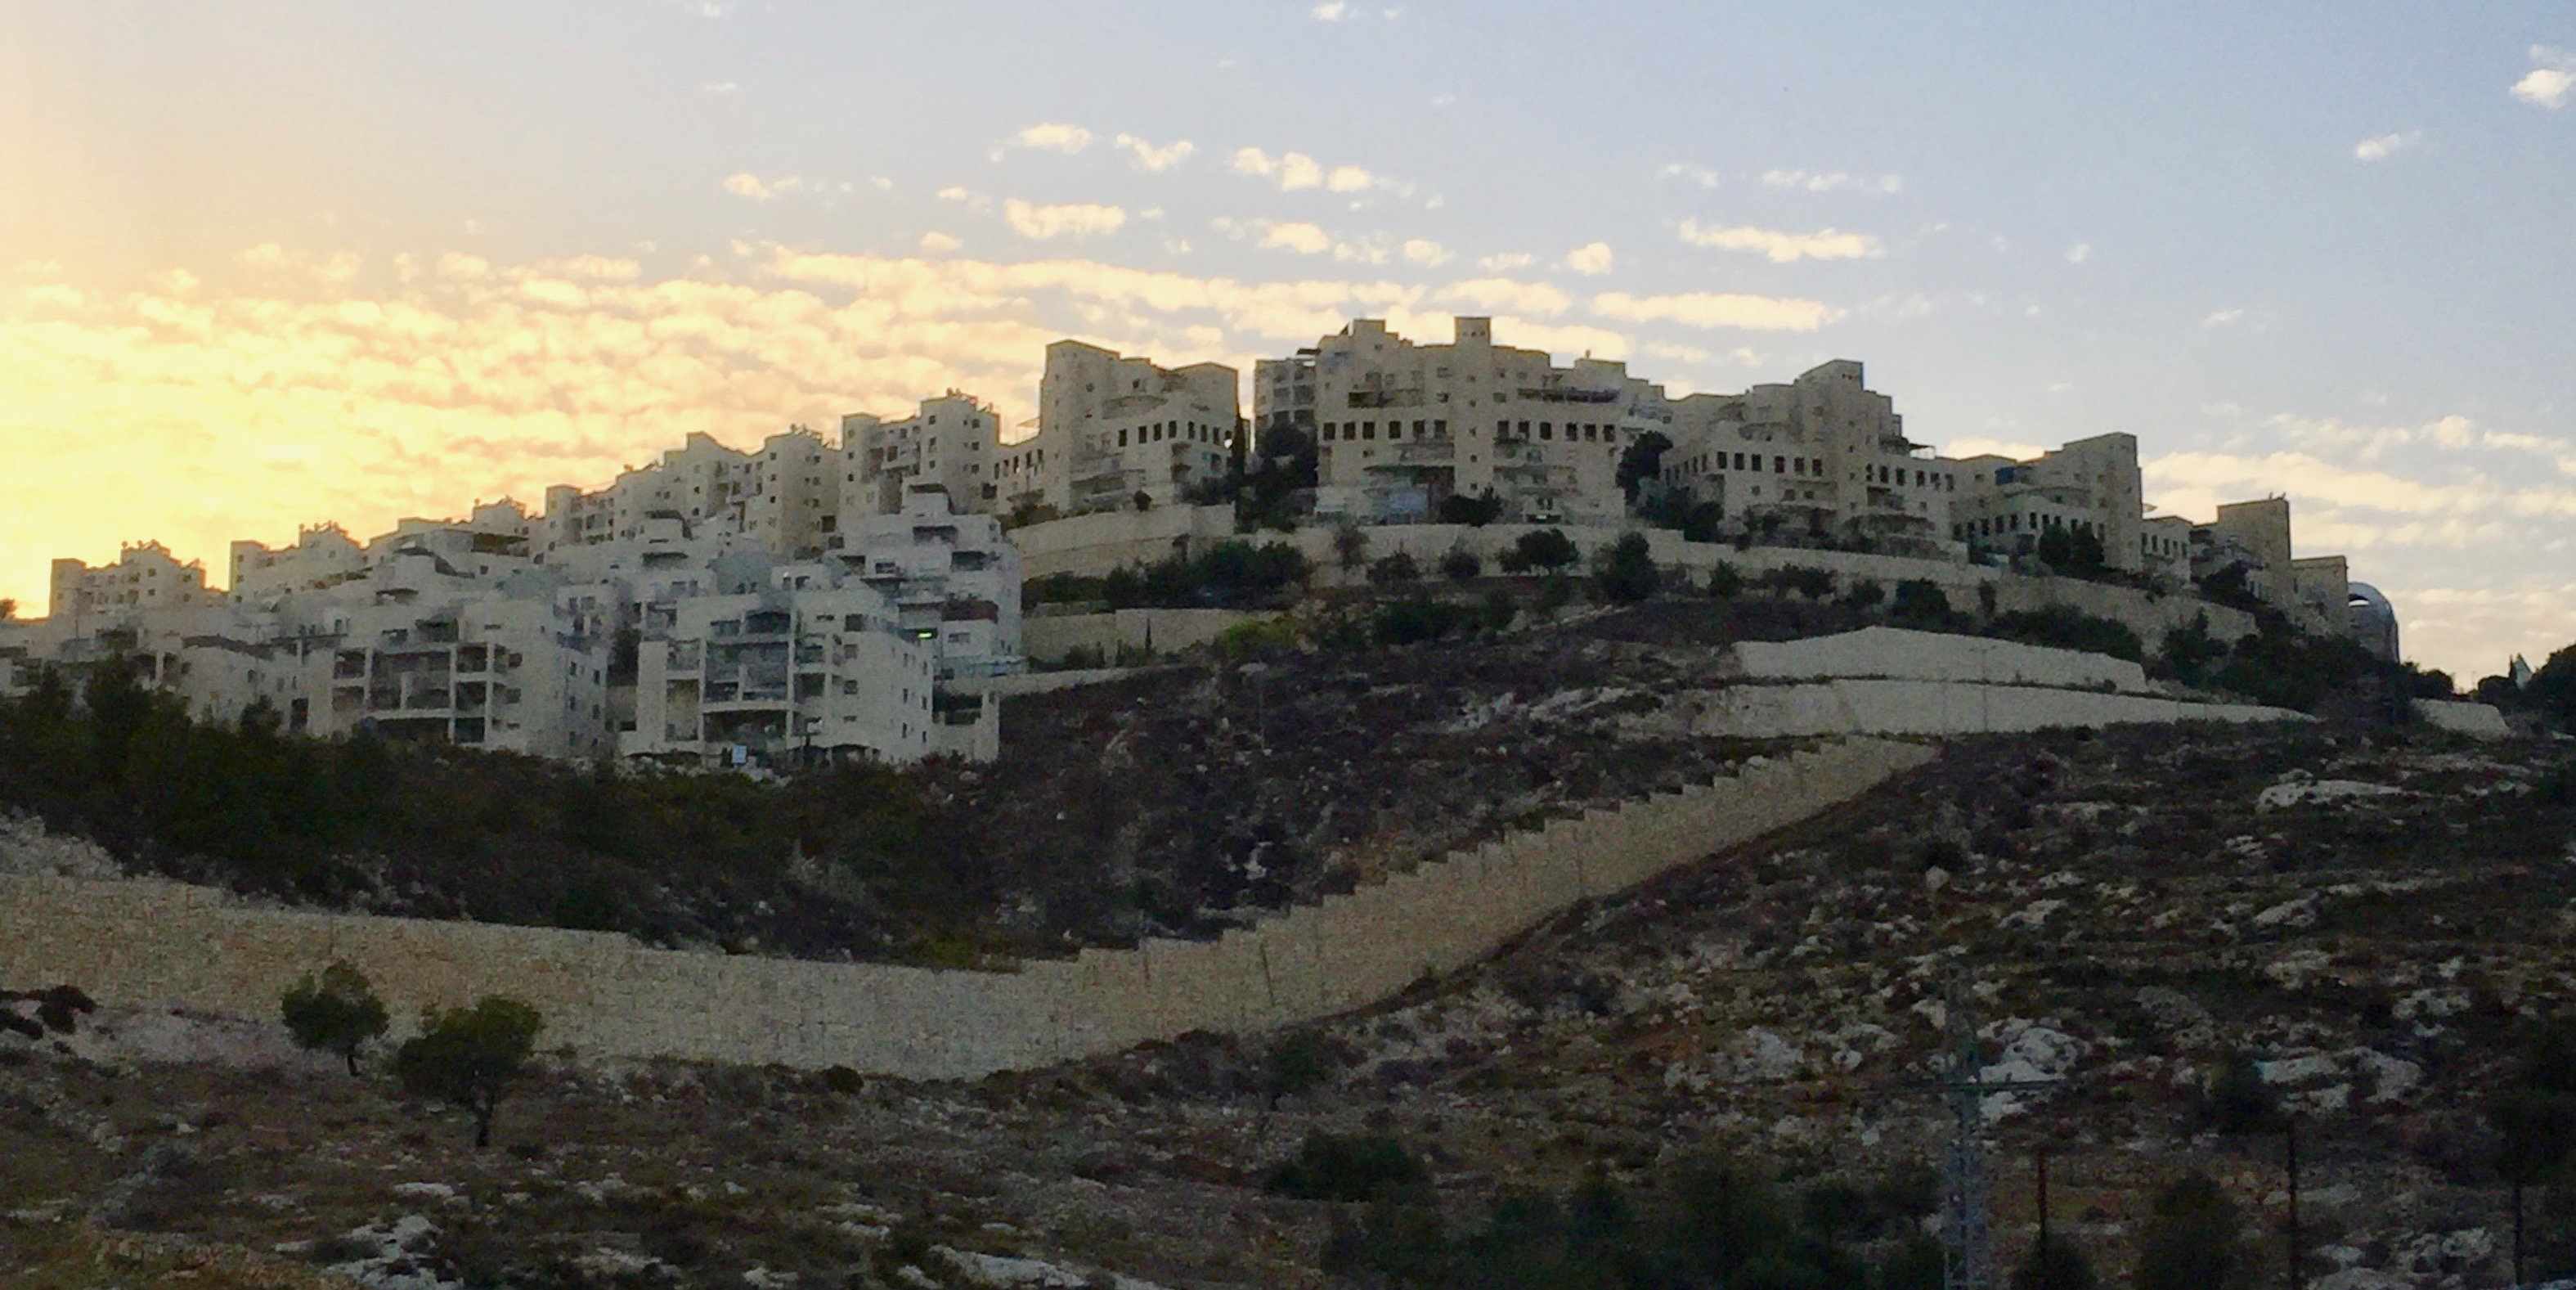 Leaving Bethlehem